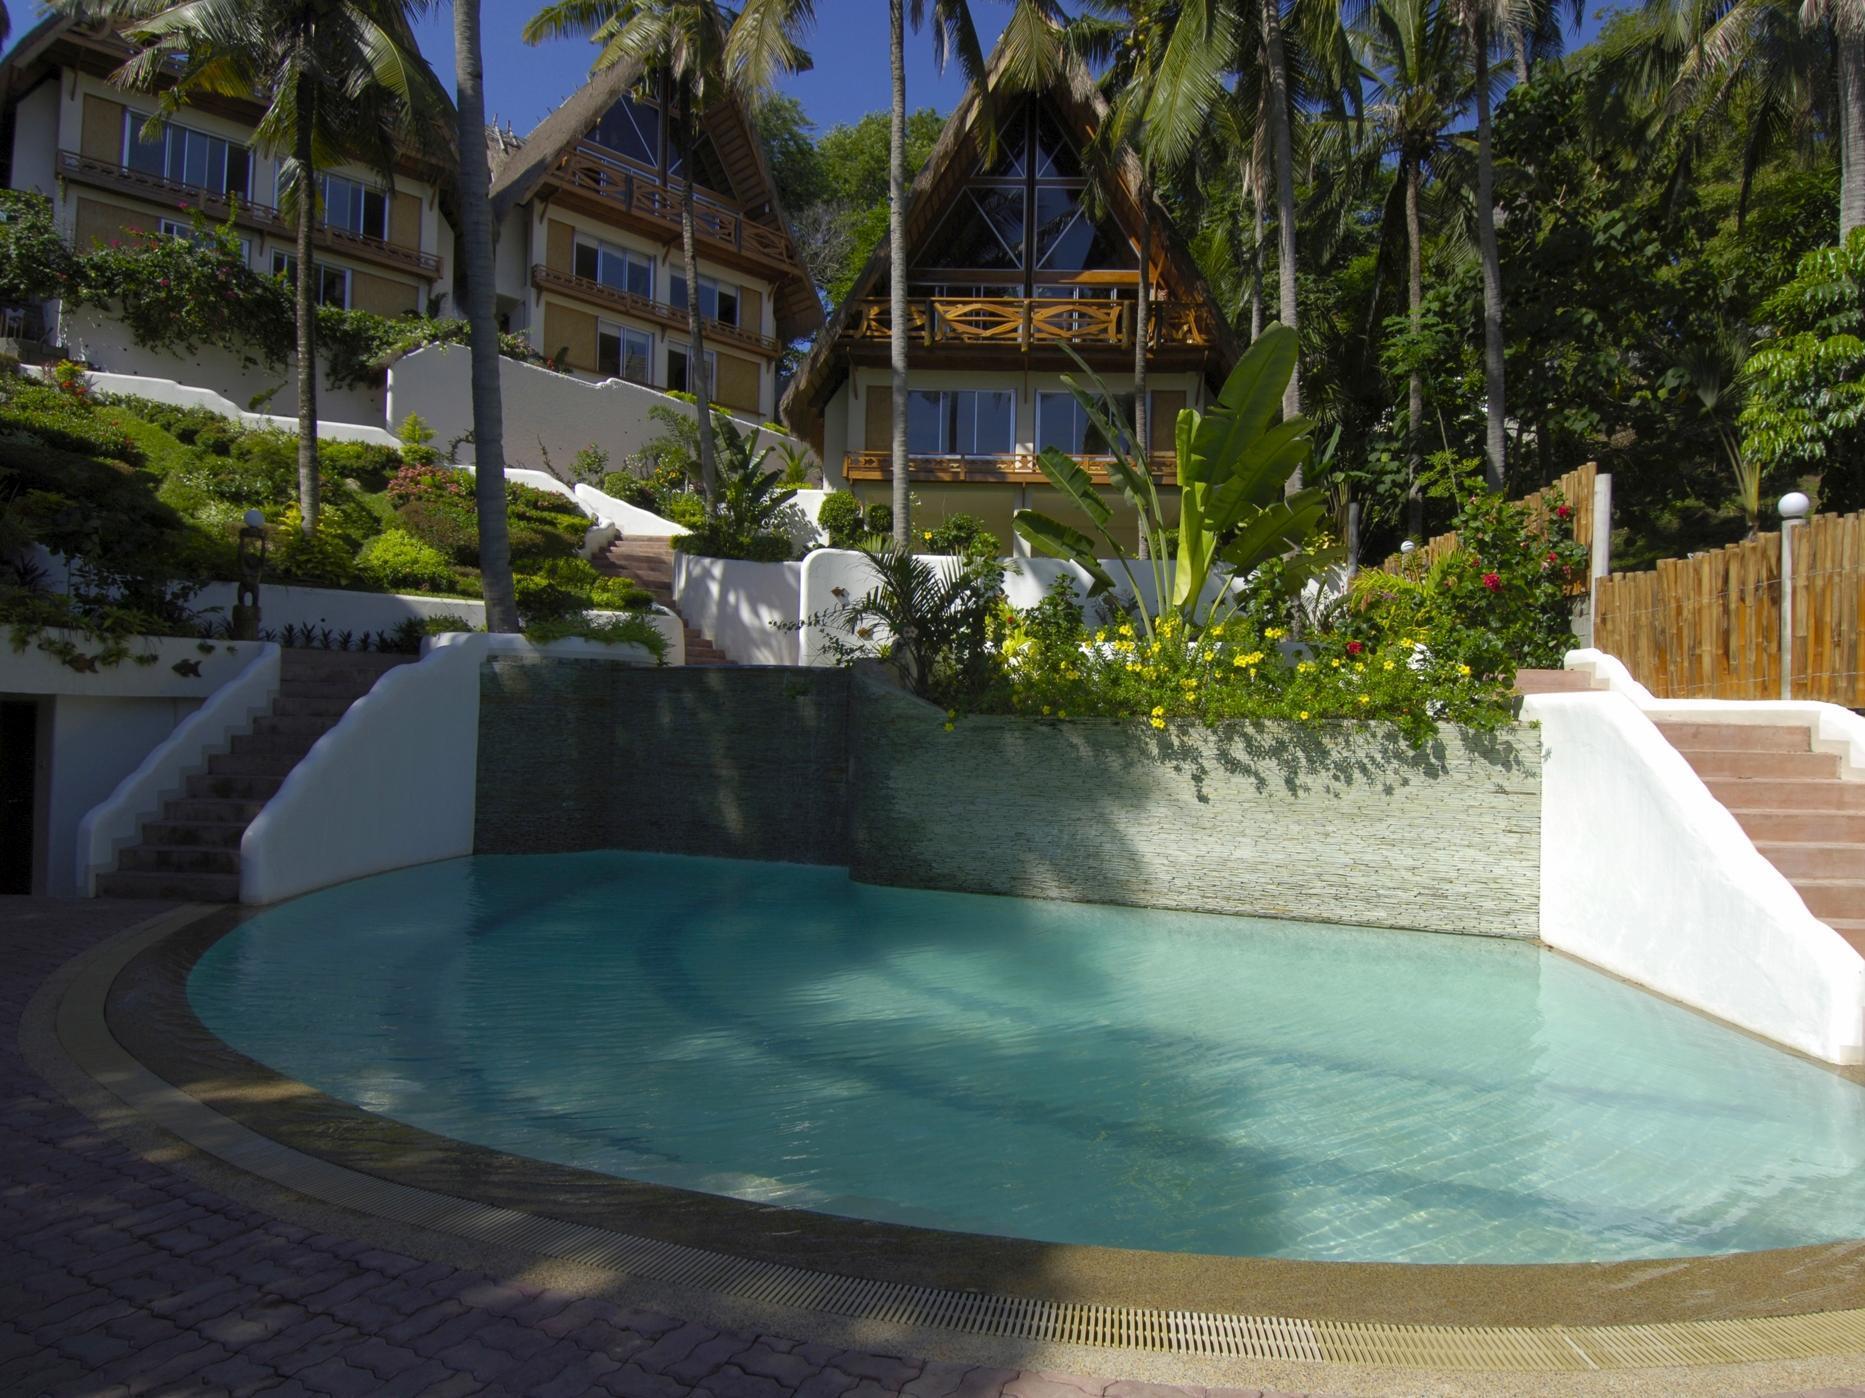 Waimea Luxury Houses - El Galleon Dive Resort Annex, Puerto Galera